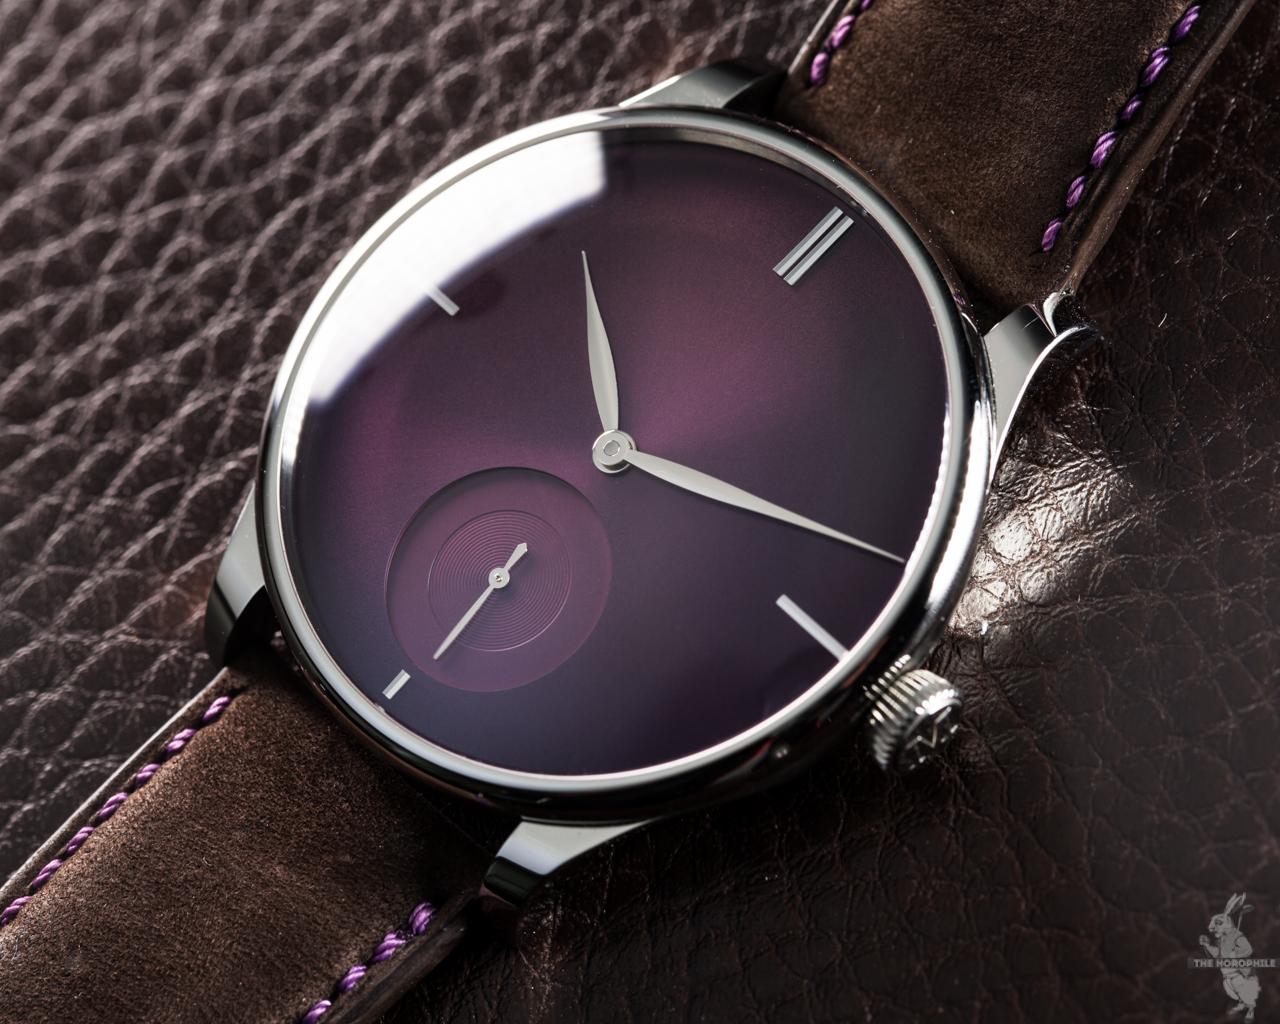 The Horophile x H. Moser & Cie. Venturer Small Seconds XL Purple Haze